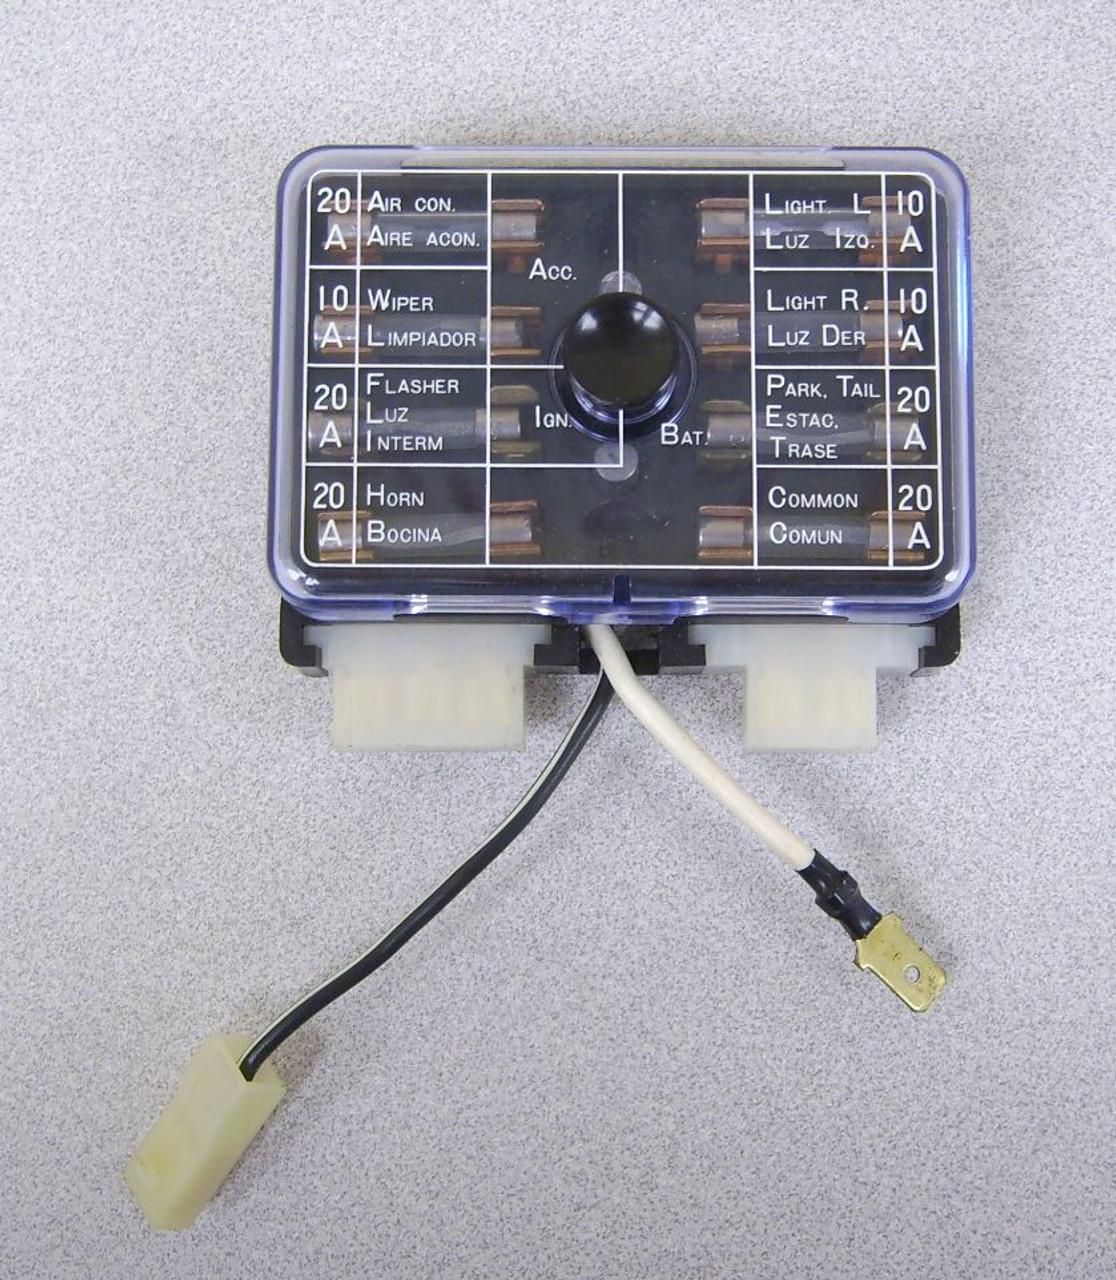 hight resolution of datsun 510 fuse box cover wiring diagrams export blown fuse in breaker box datsun fuse box